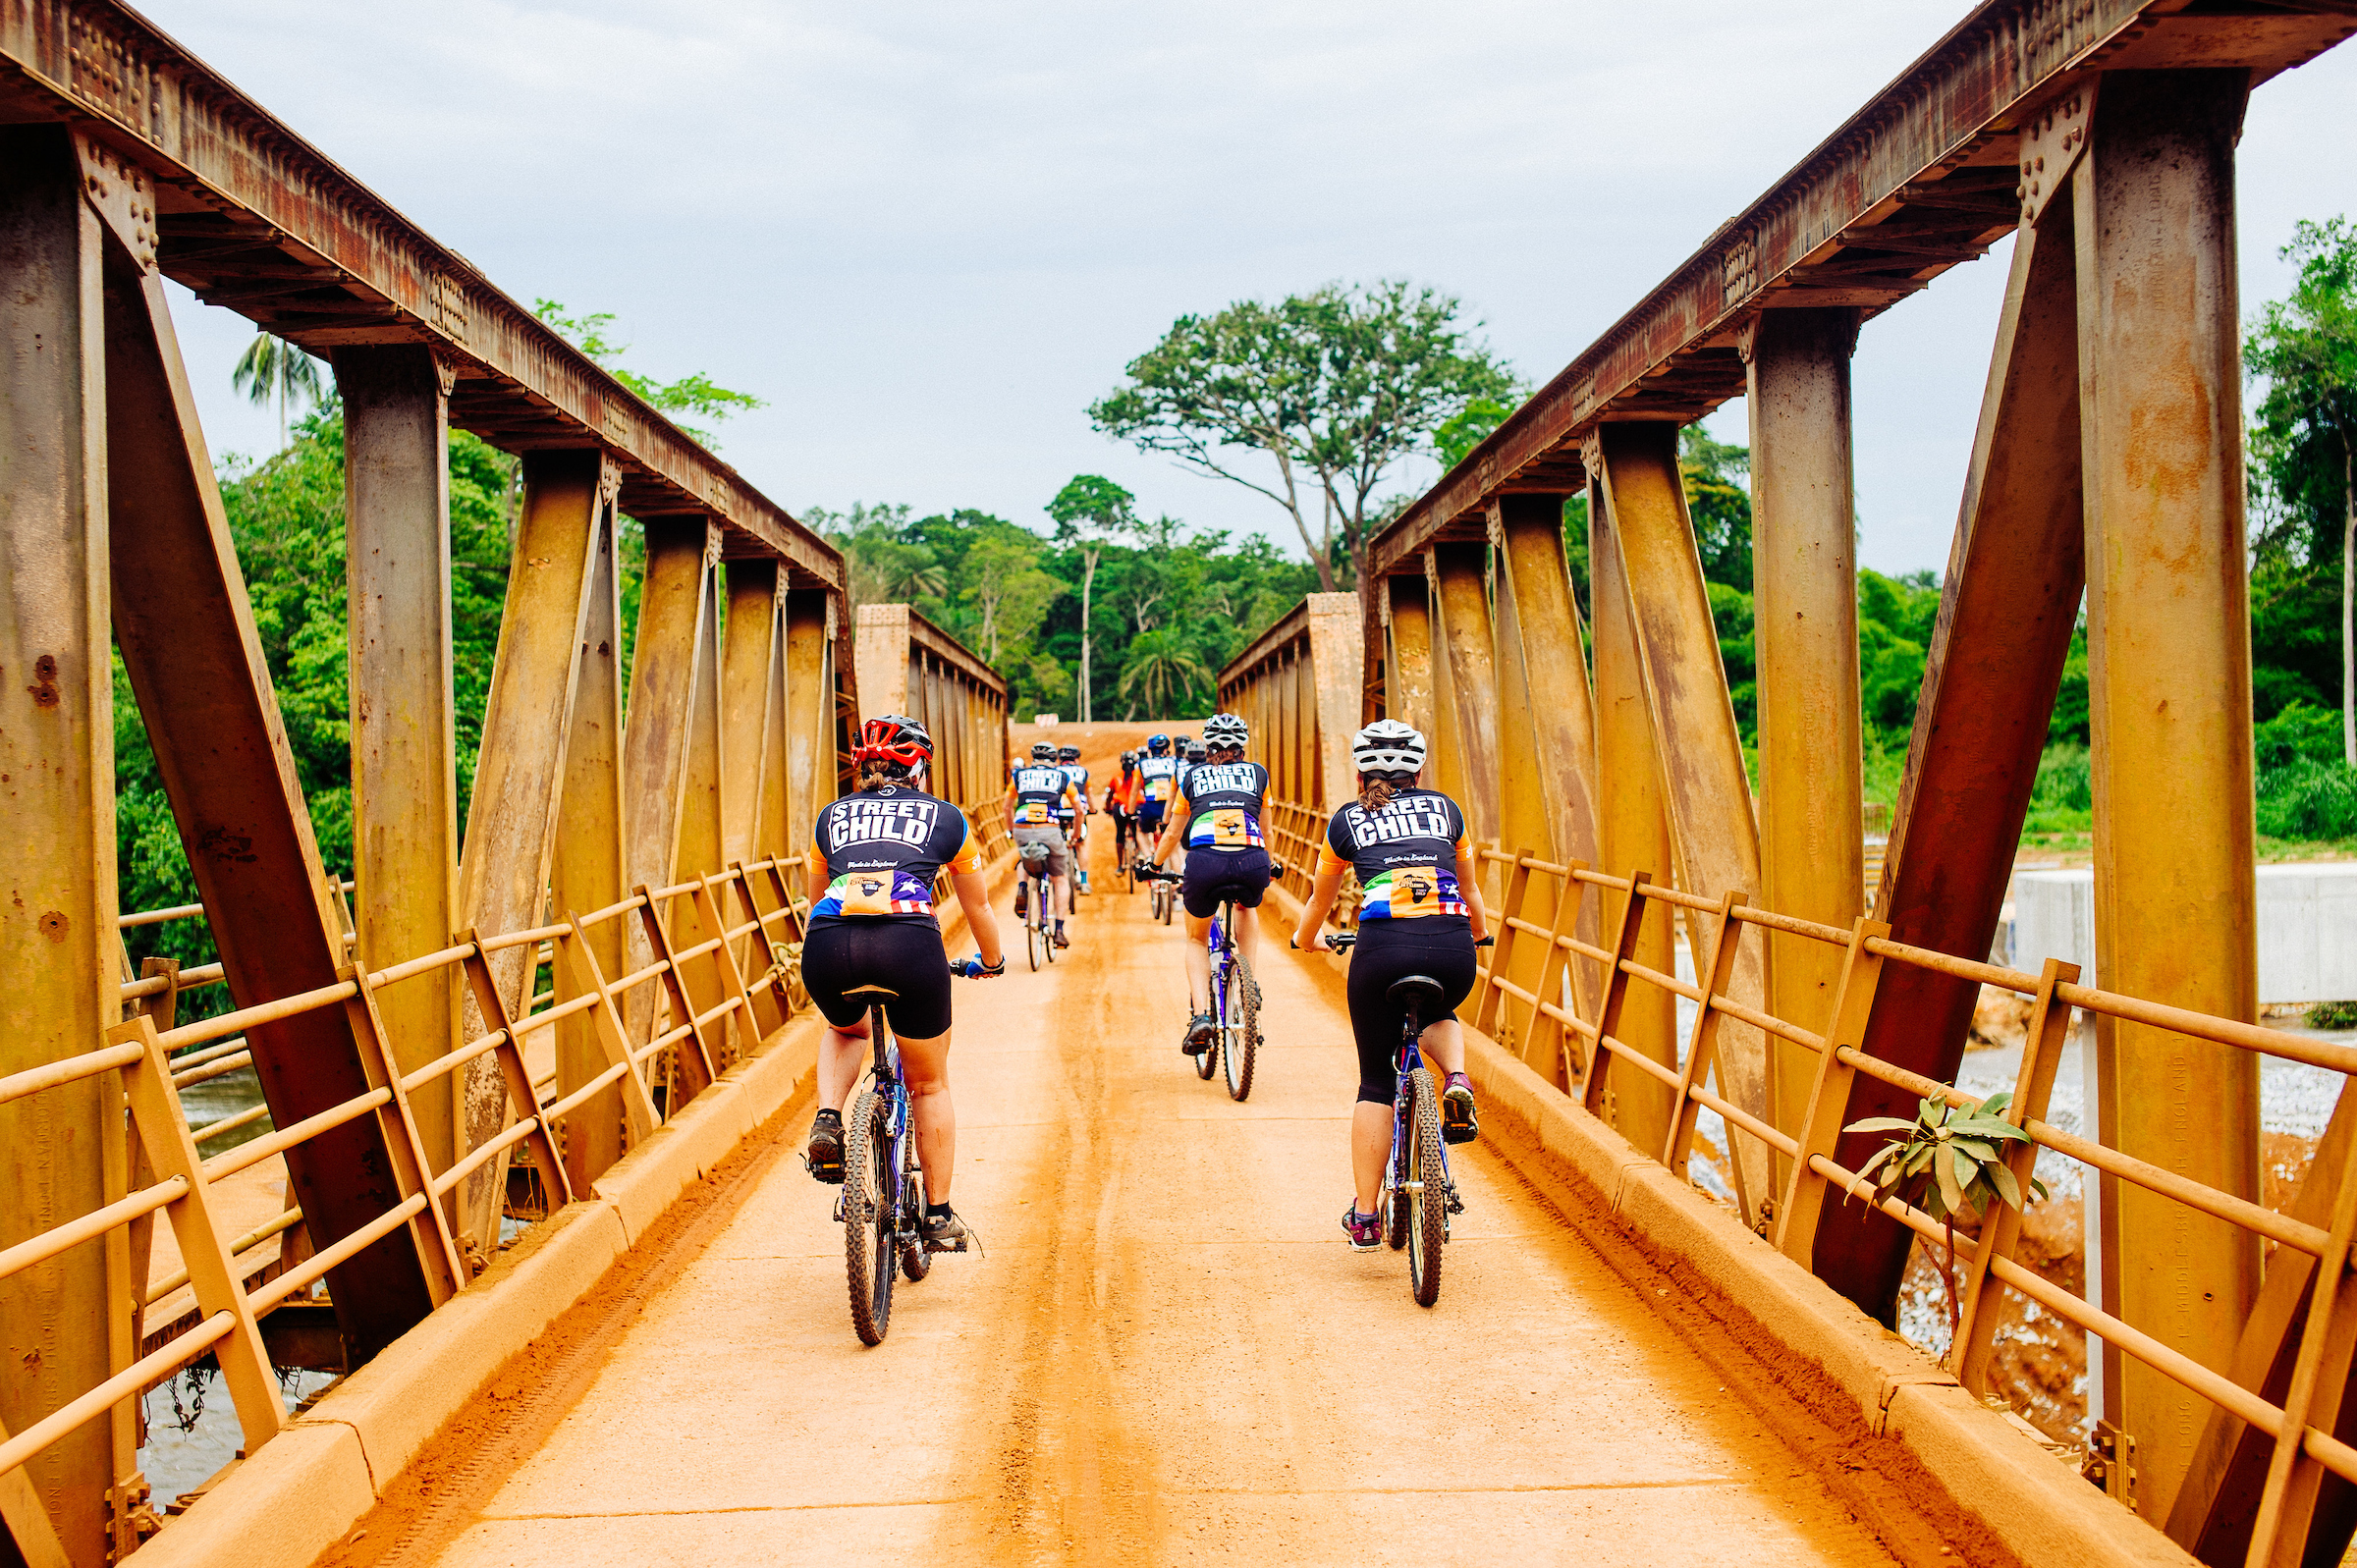 West+Africa+Cycle+Challenge-3.jpeg